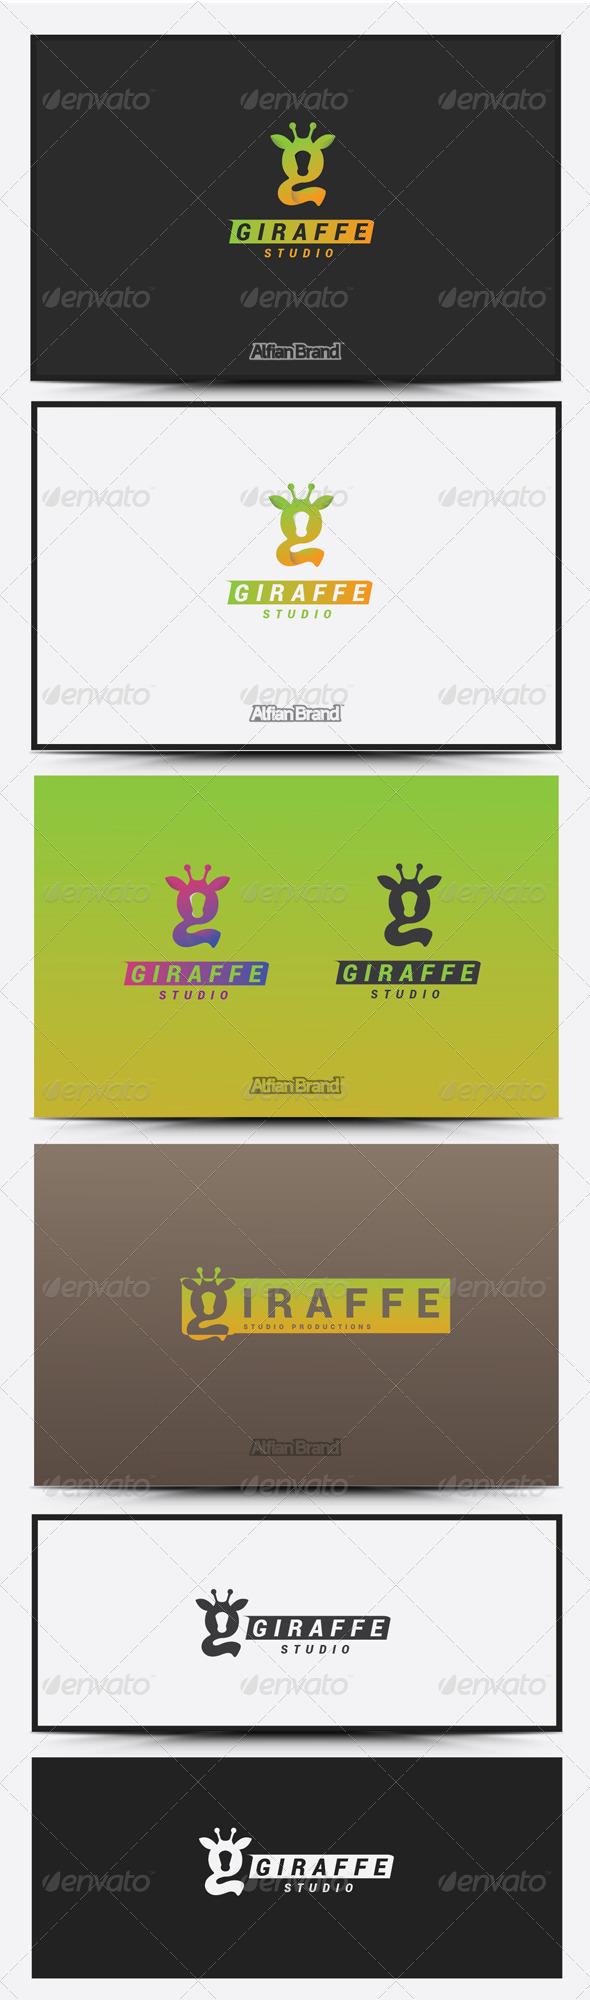 GraphicRiver Giraffe Logo 8418950